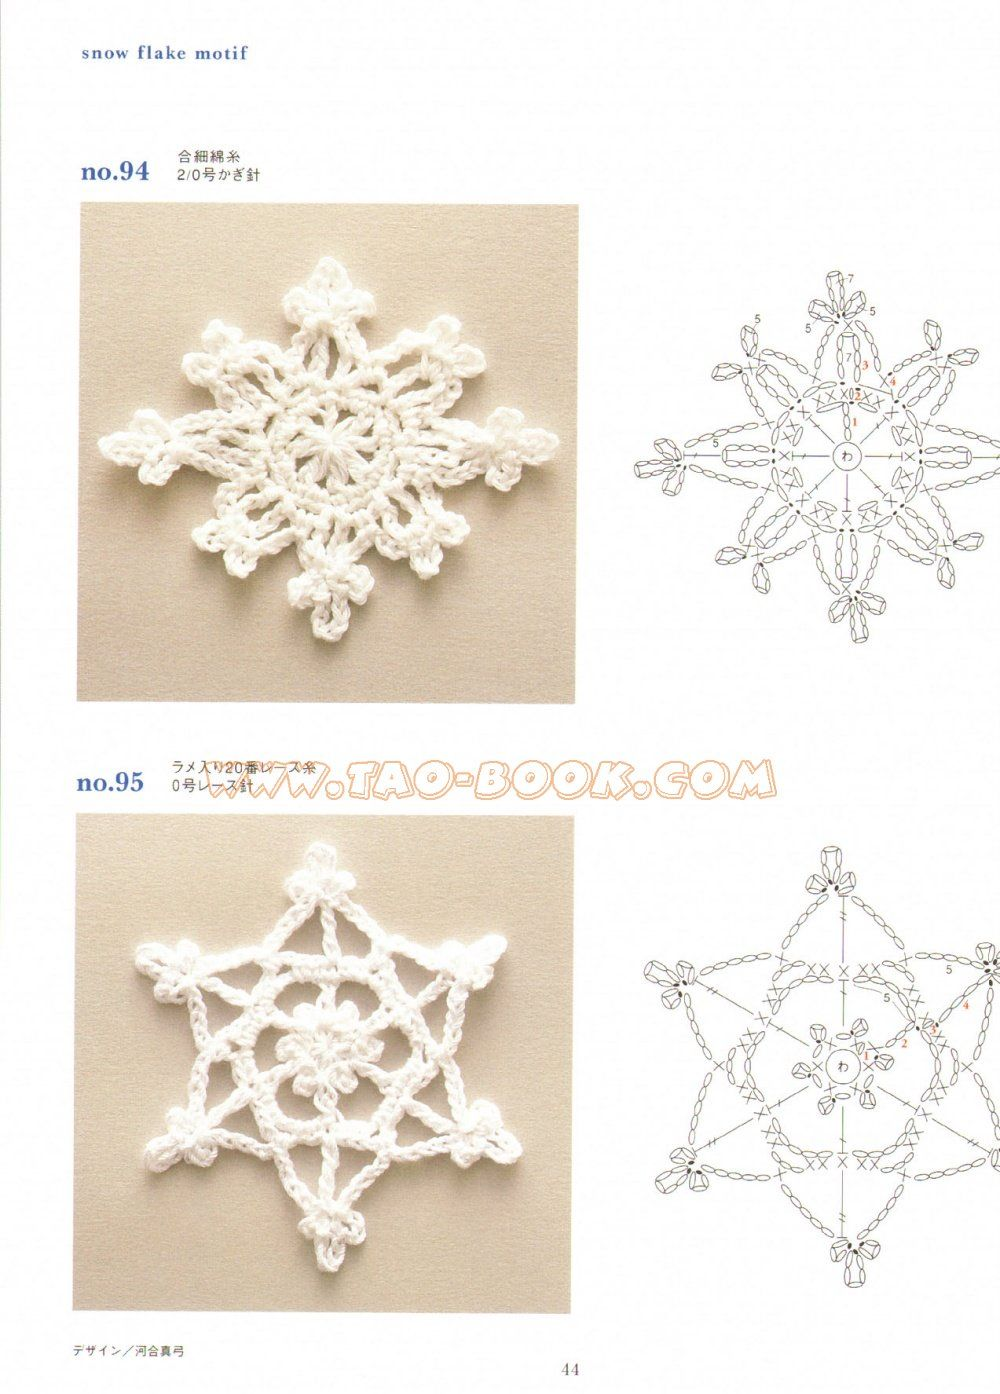 Pin de Mayabhell Tapia en navidad | Pinterest | Croché, Ganchillo y ...